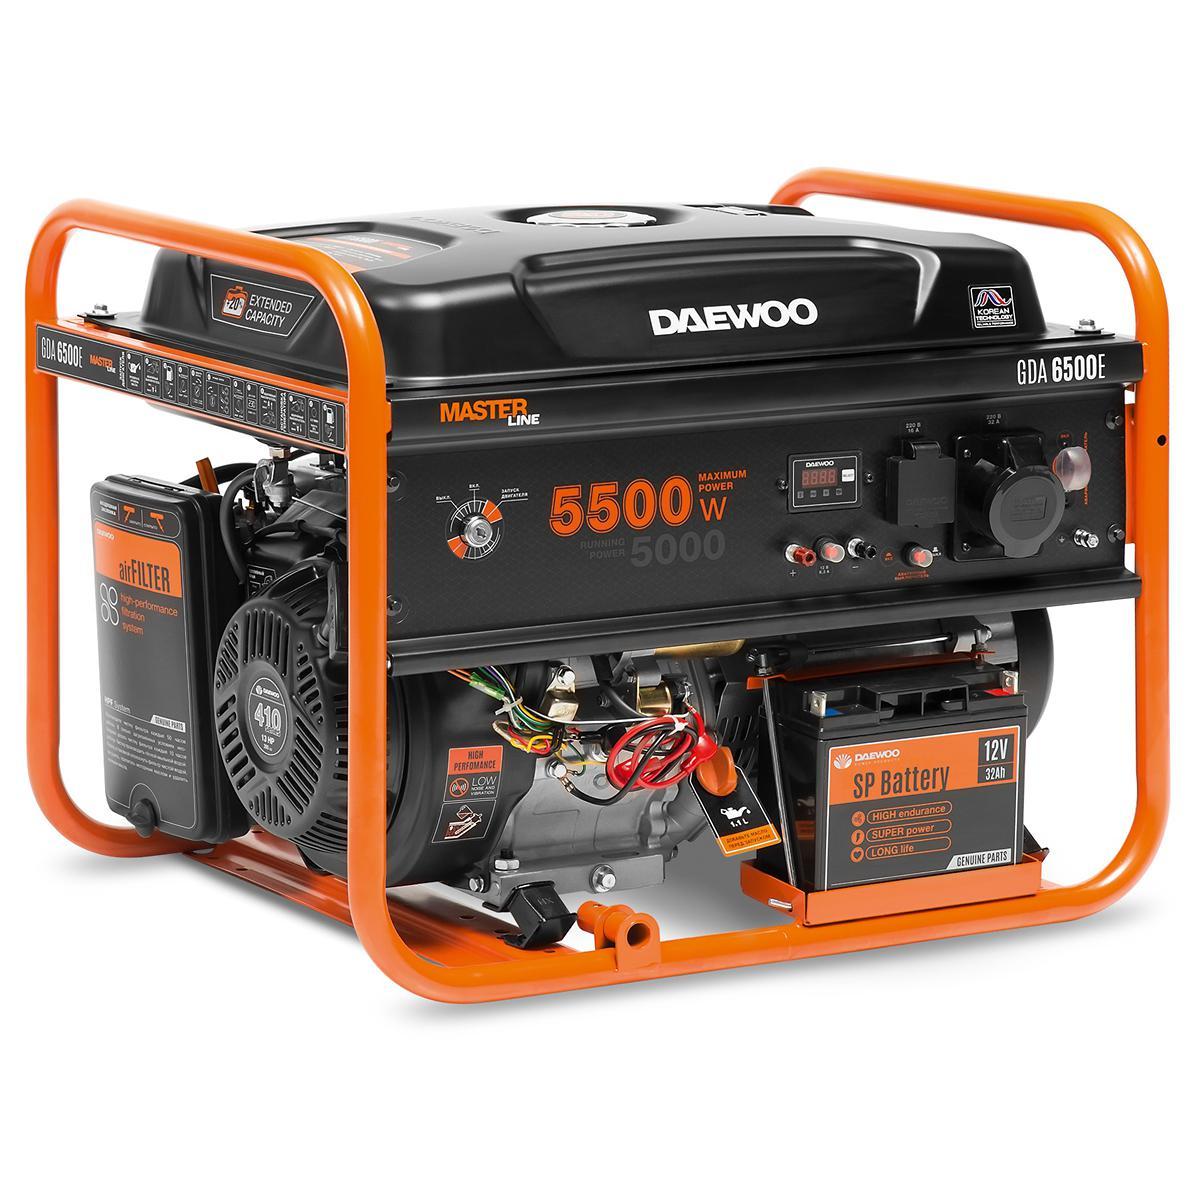 Генератор Daewoo Gda 6500e электрический генератор и электростанция daewoo power products gda 3500 e